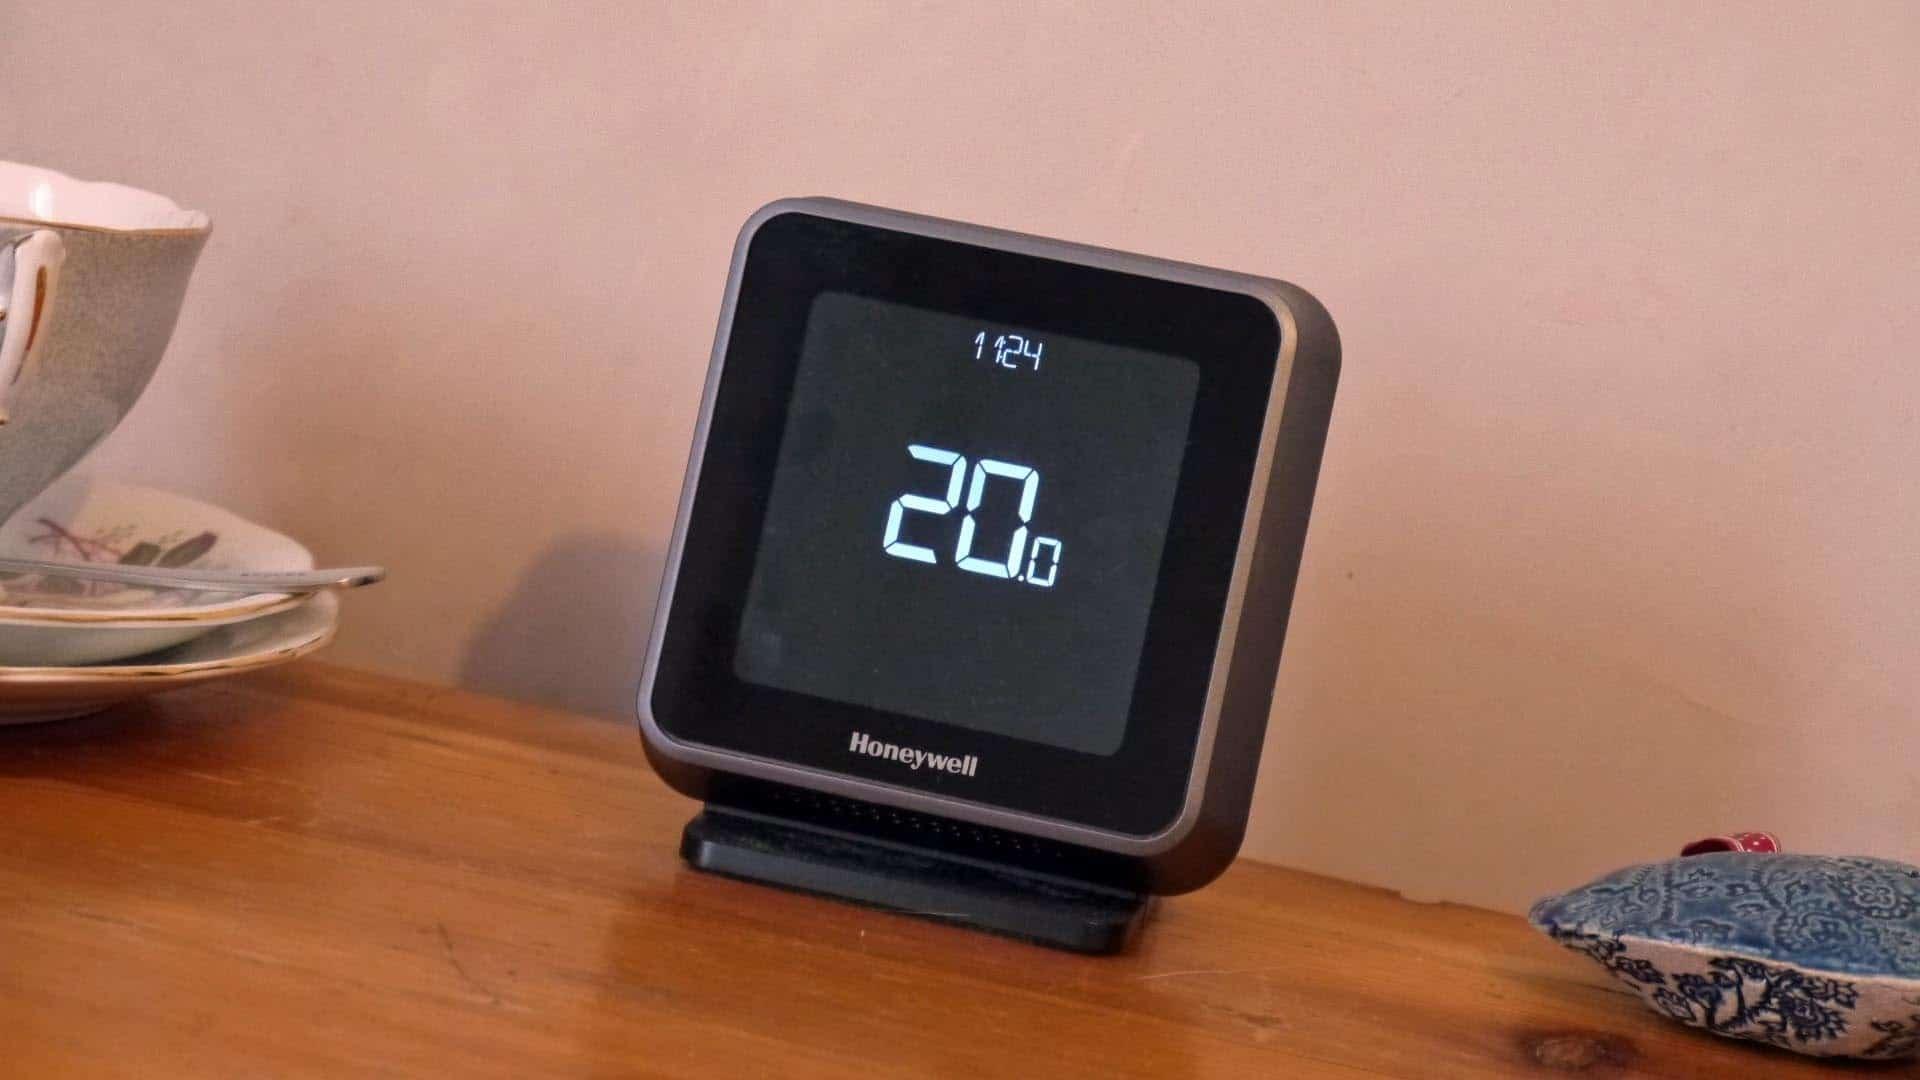 termostato Honeywell Home T6R.